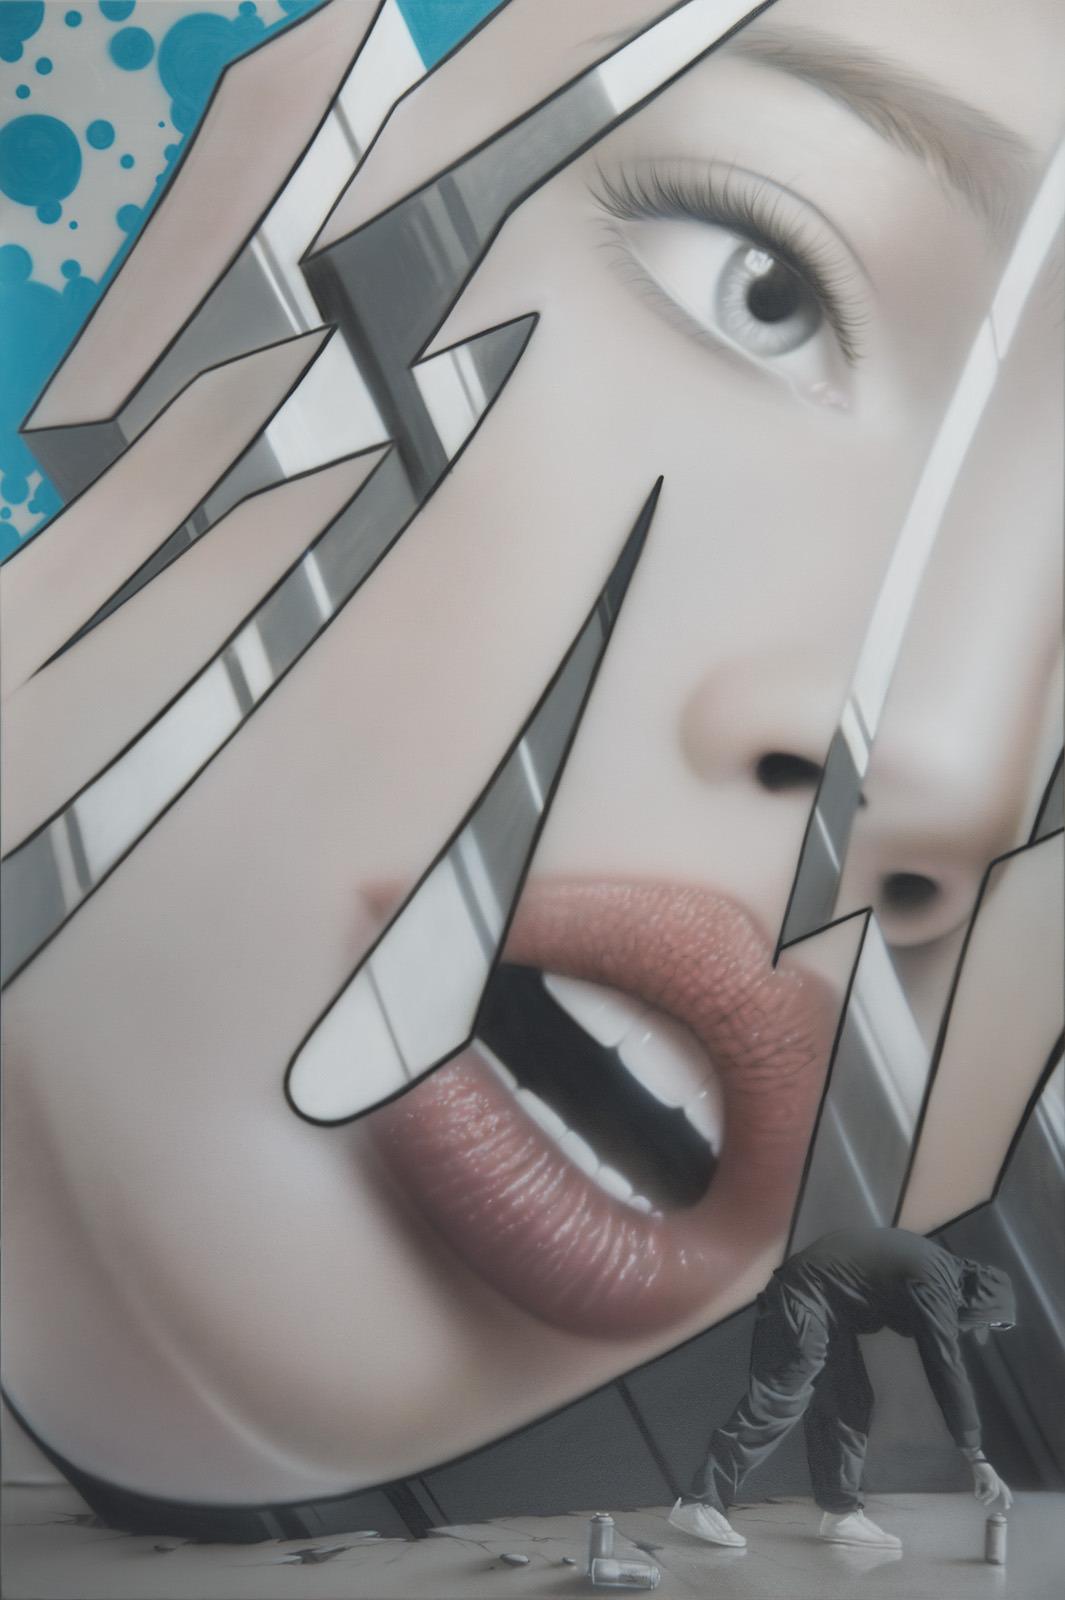 Los Graffitis realistas de Adam Klodzinski 643